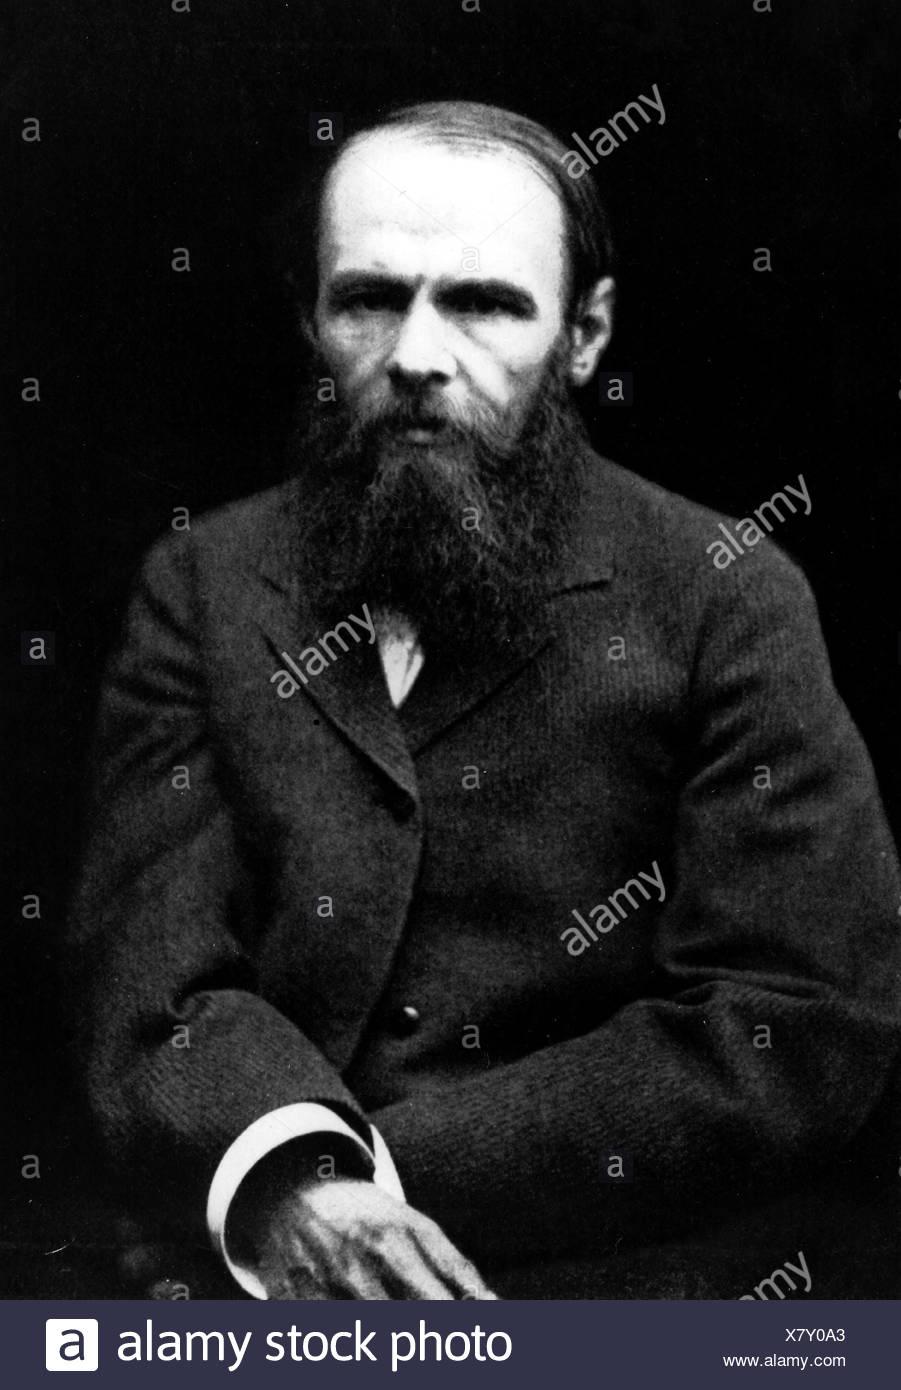 Dostoevsky, Fyodor Mikhailovich, 11.11.1821 - 9.2.1881, Russian writer, novelist, half length, Additional-Rights-Clearances-NA - Stock Image